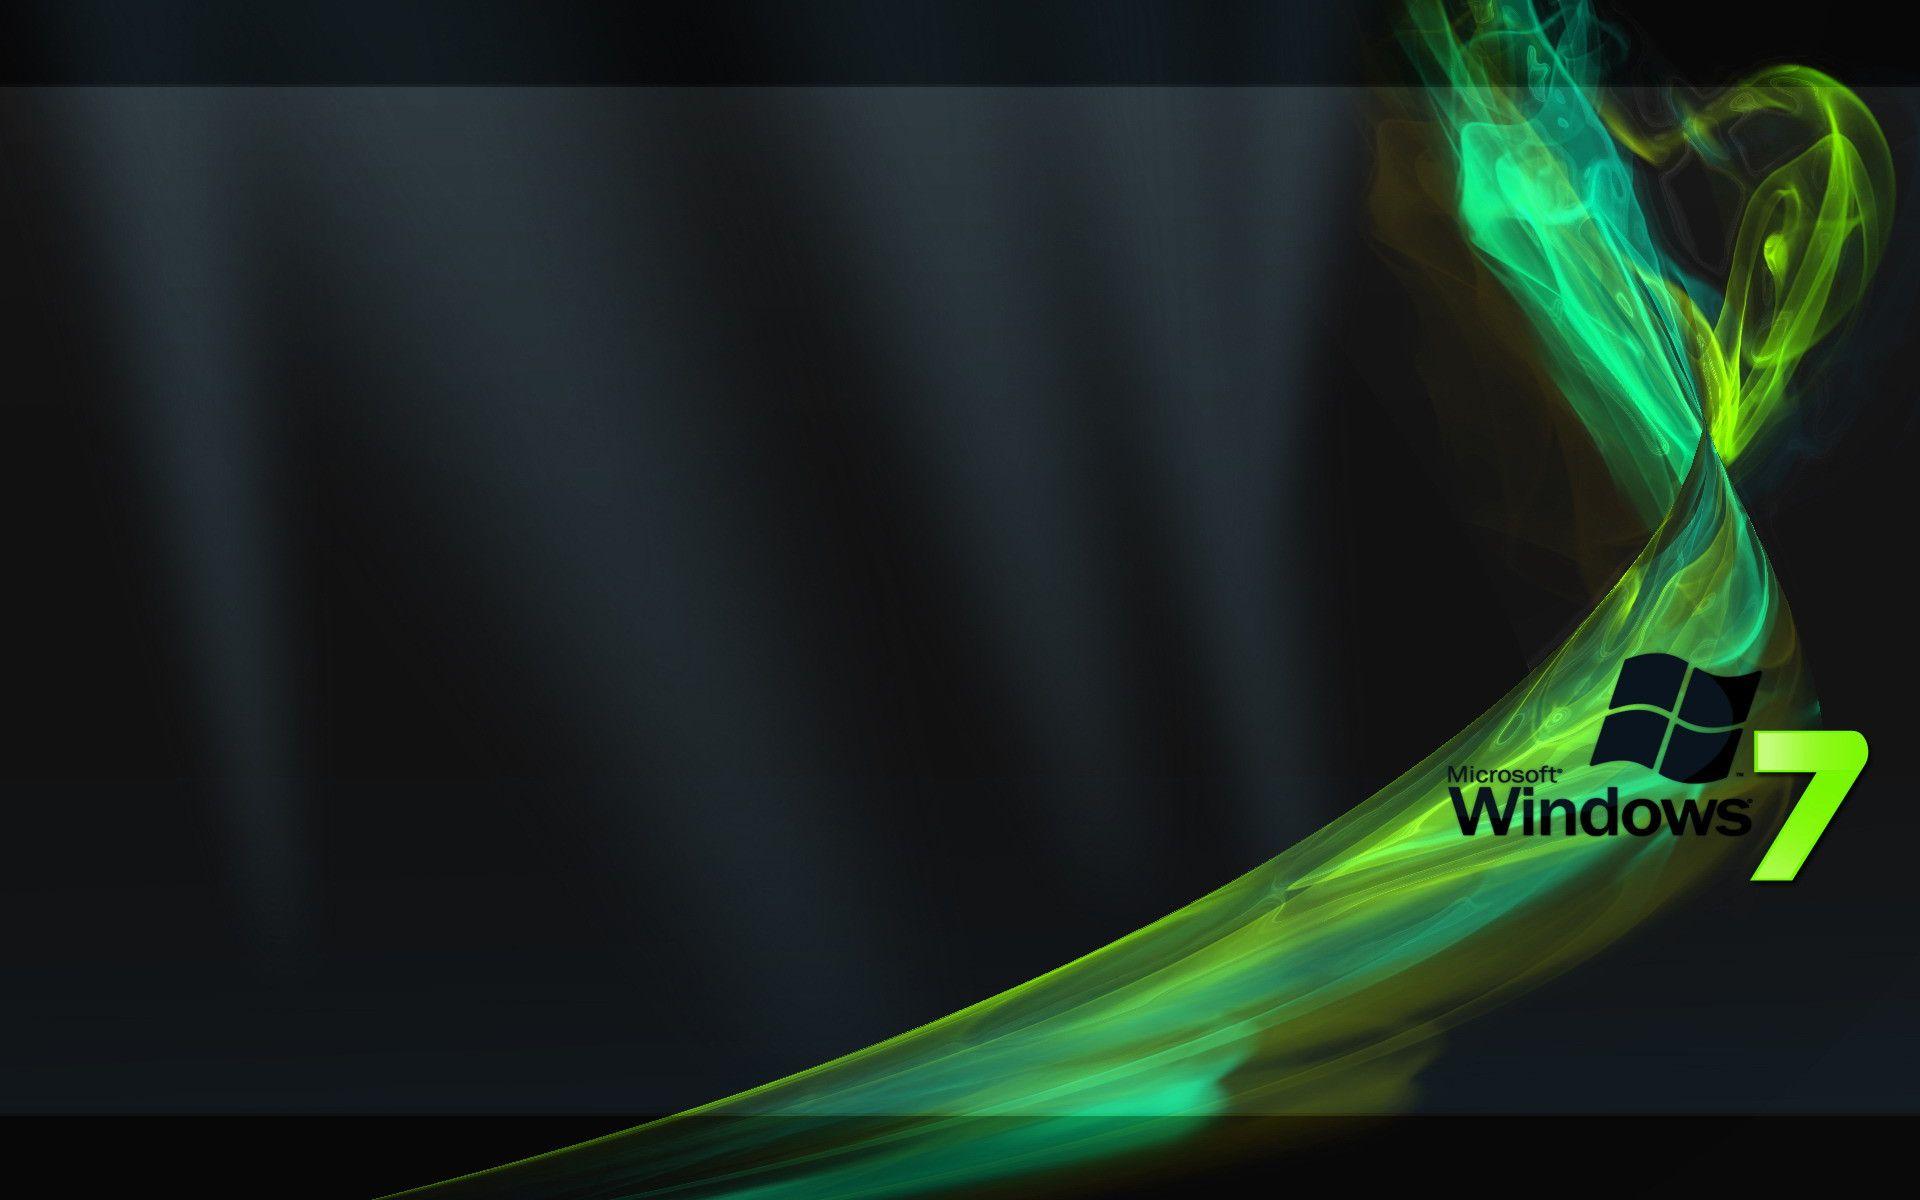 Hd wallpaper windows 7 - Windows Hd Wallpapers Free Download New Hd Wallpapers Download 1920 1200 Windows 7 New Wallpapers